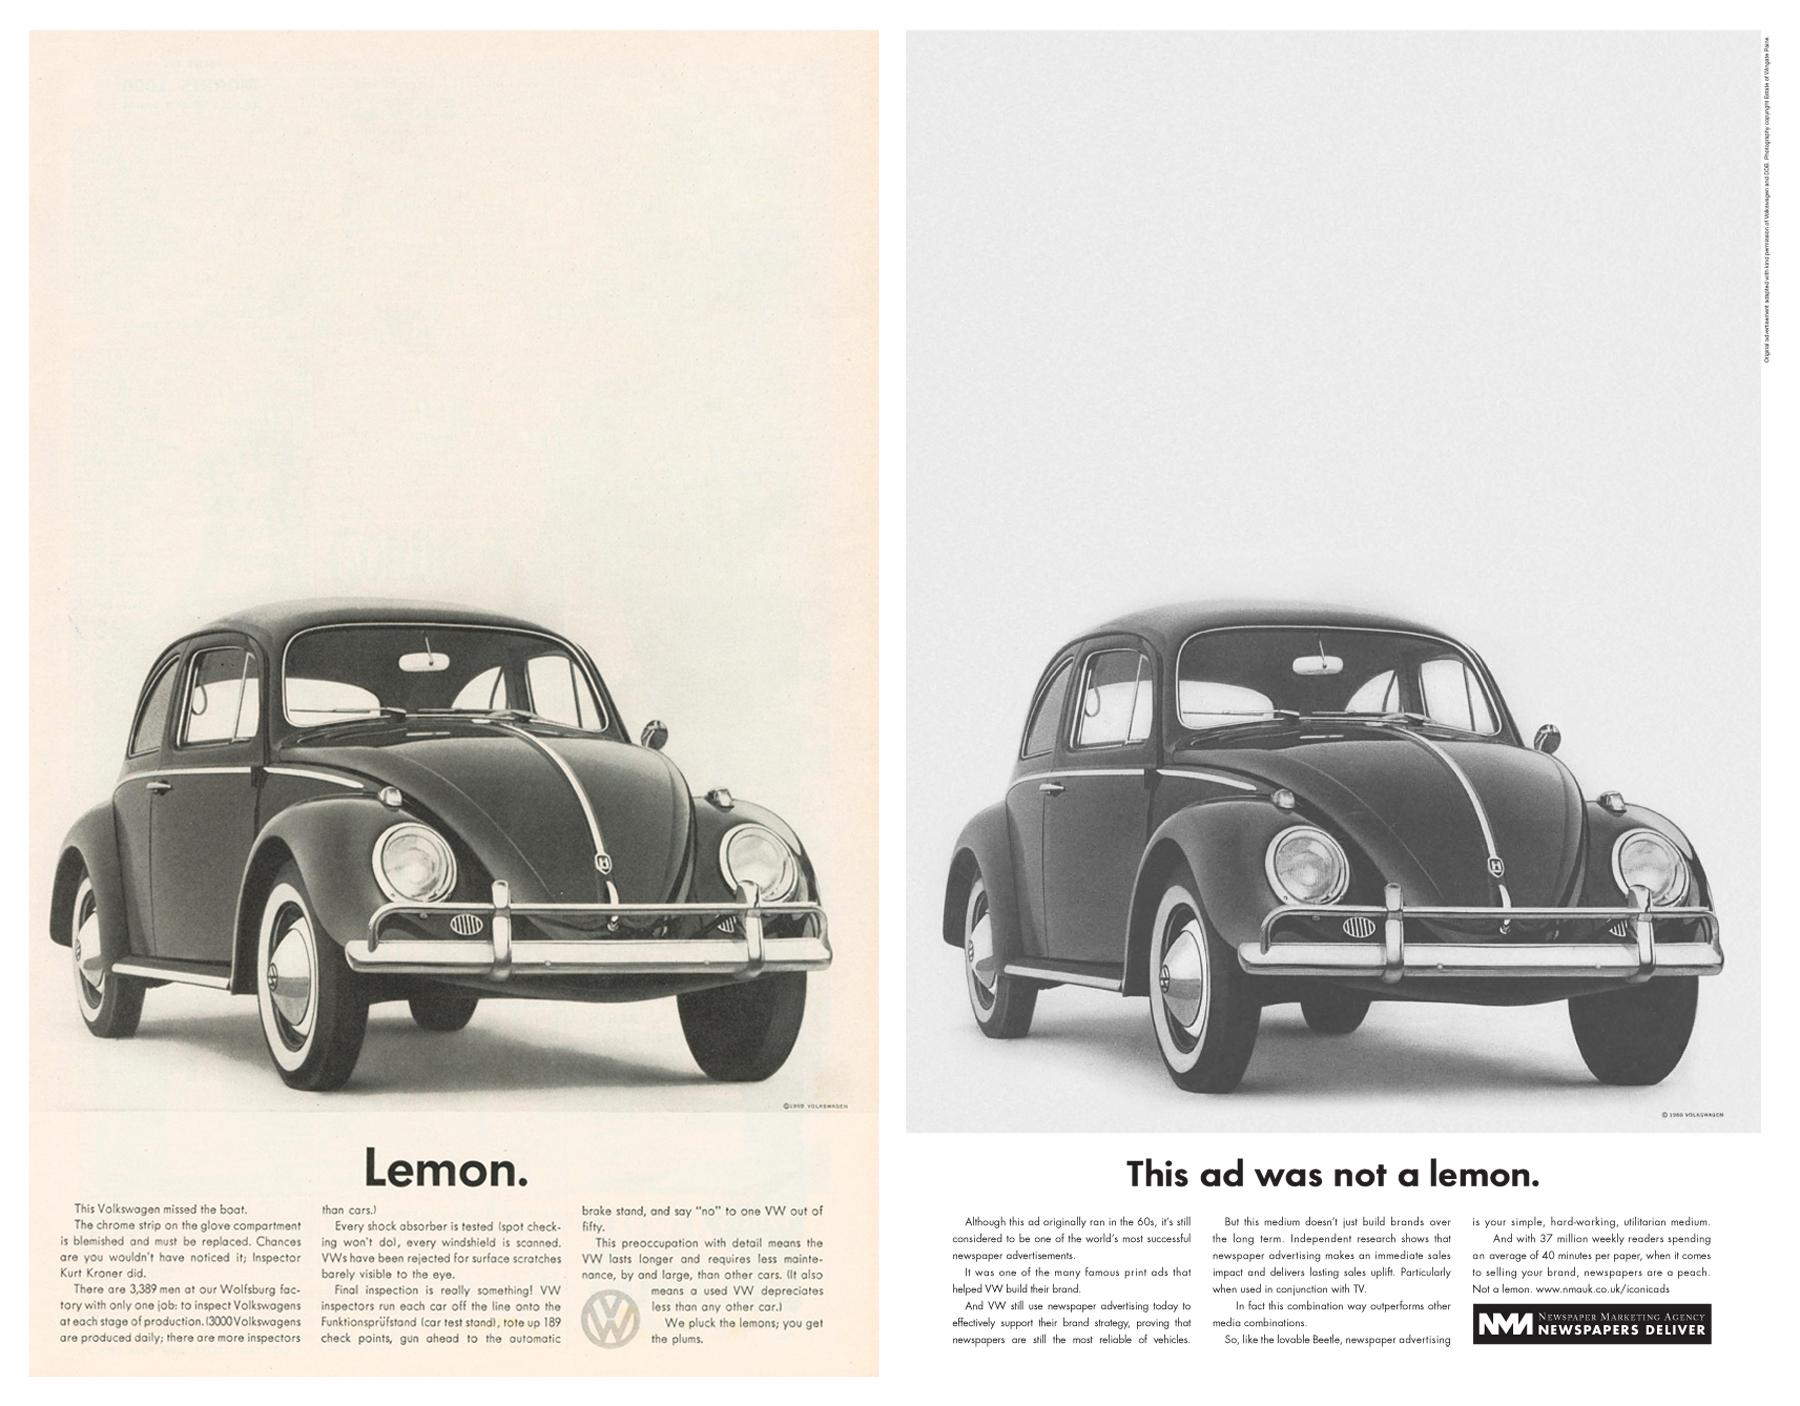 2008 Newpaper marketing agency volkswagen-lemon-advert1